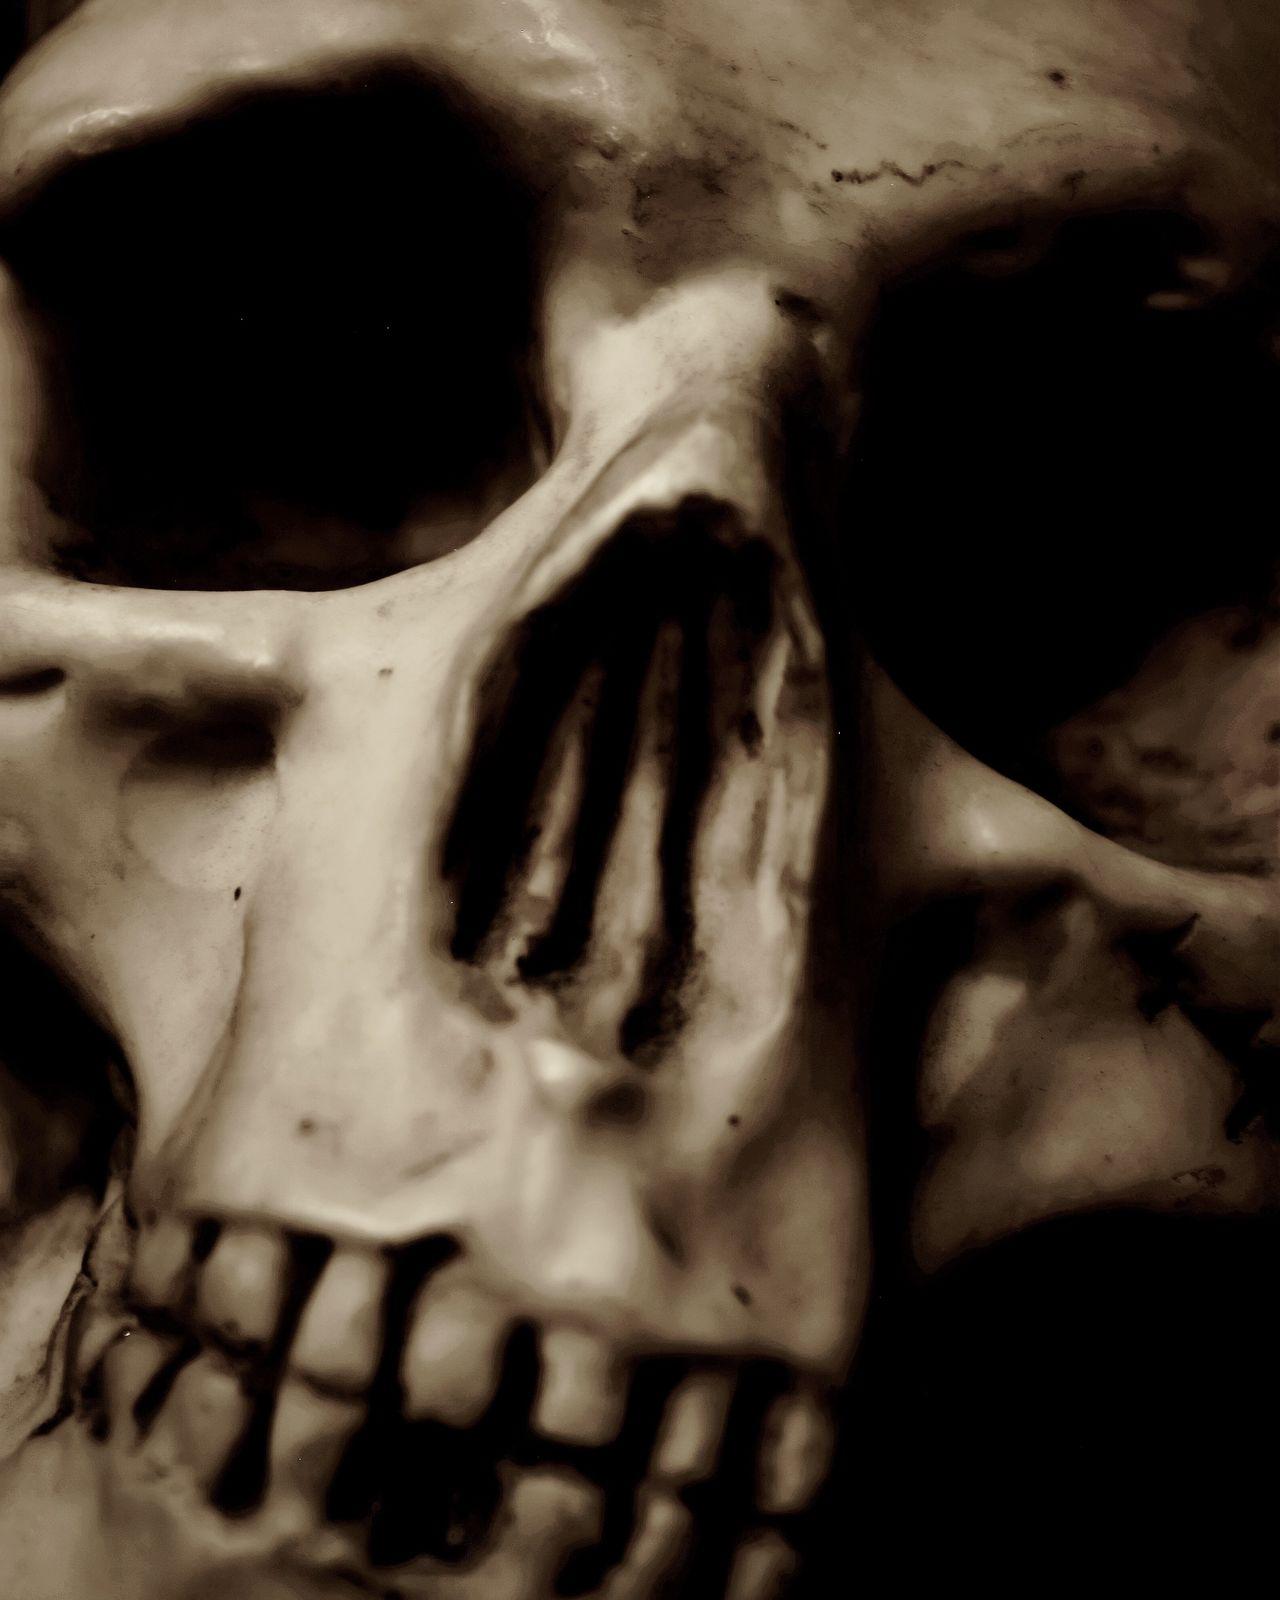 Skull Human Body Part Spooky Horror Human Skull Human Bone Human Skeleton Close-up People Death Macabre Art Blackandwhite Occult Fear Alchemy Anatomy HEAD Cranium